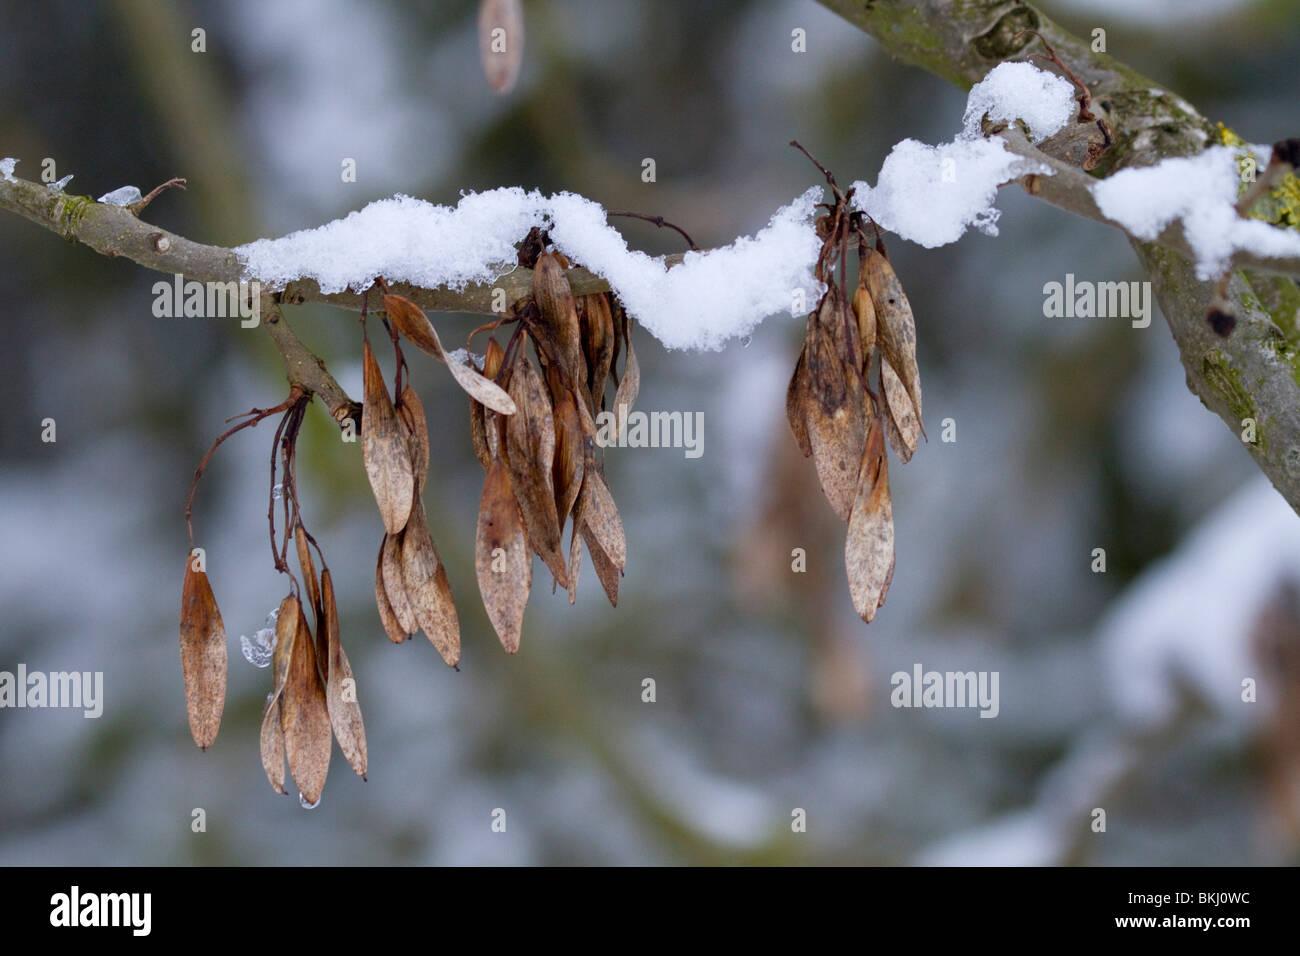 Snow on ash tree keys; winter - Stock Image